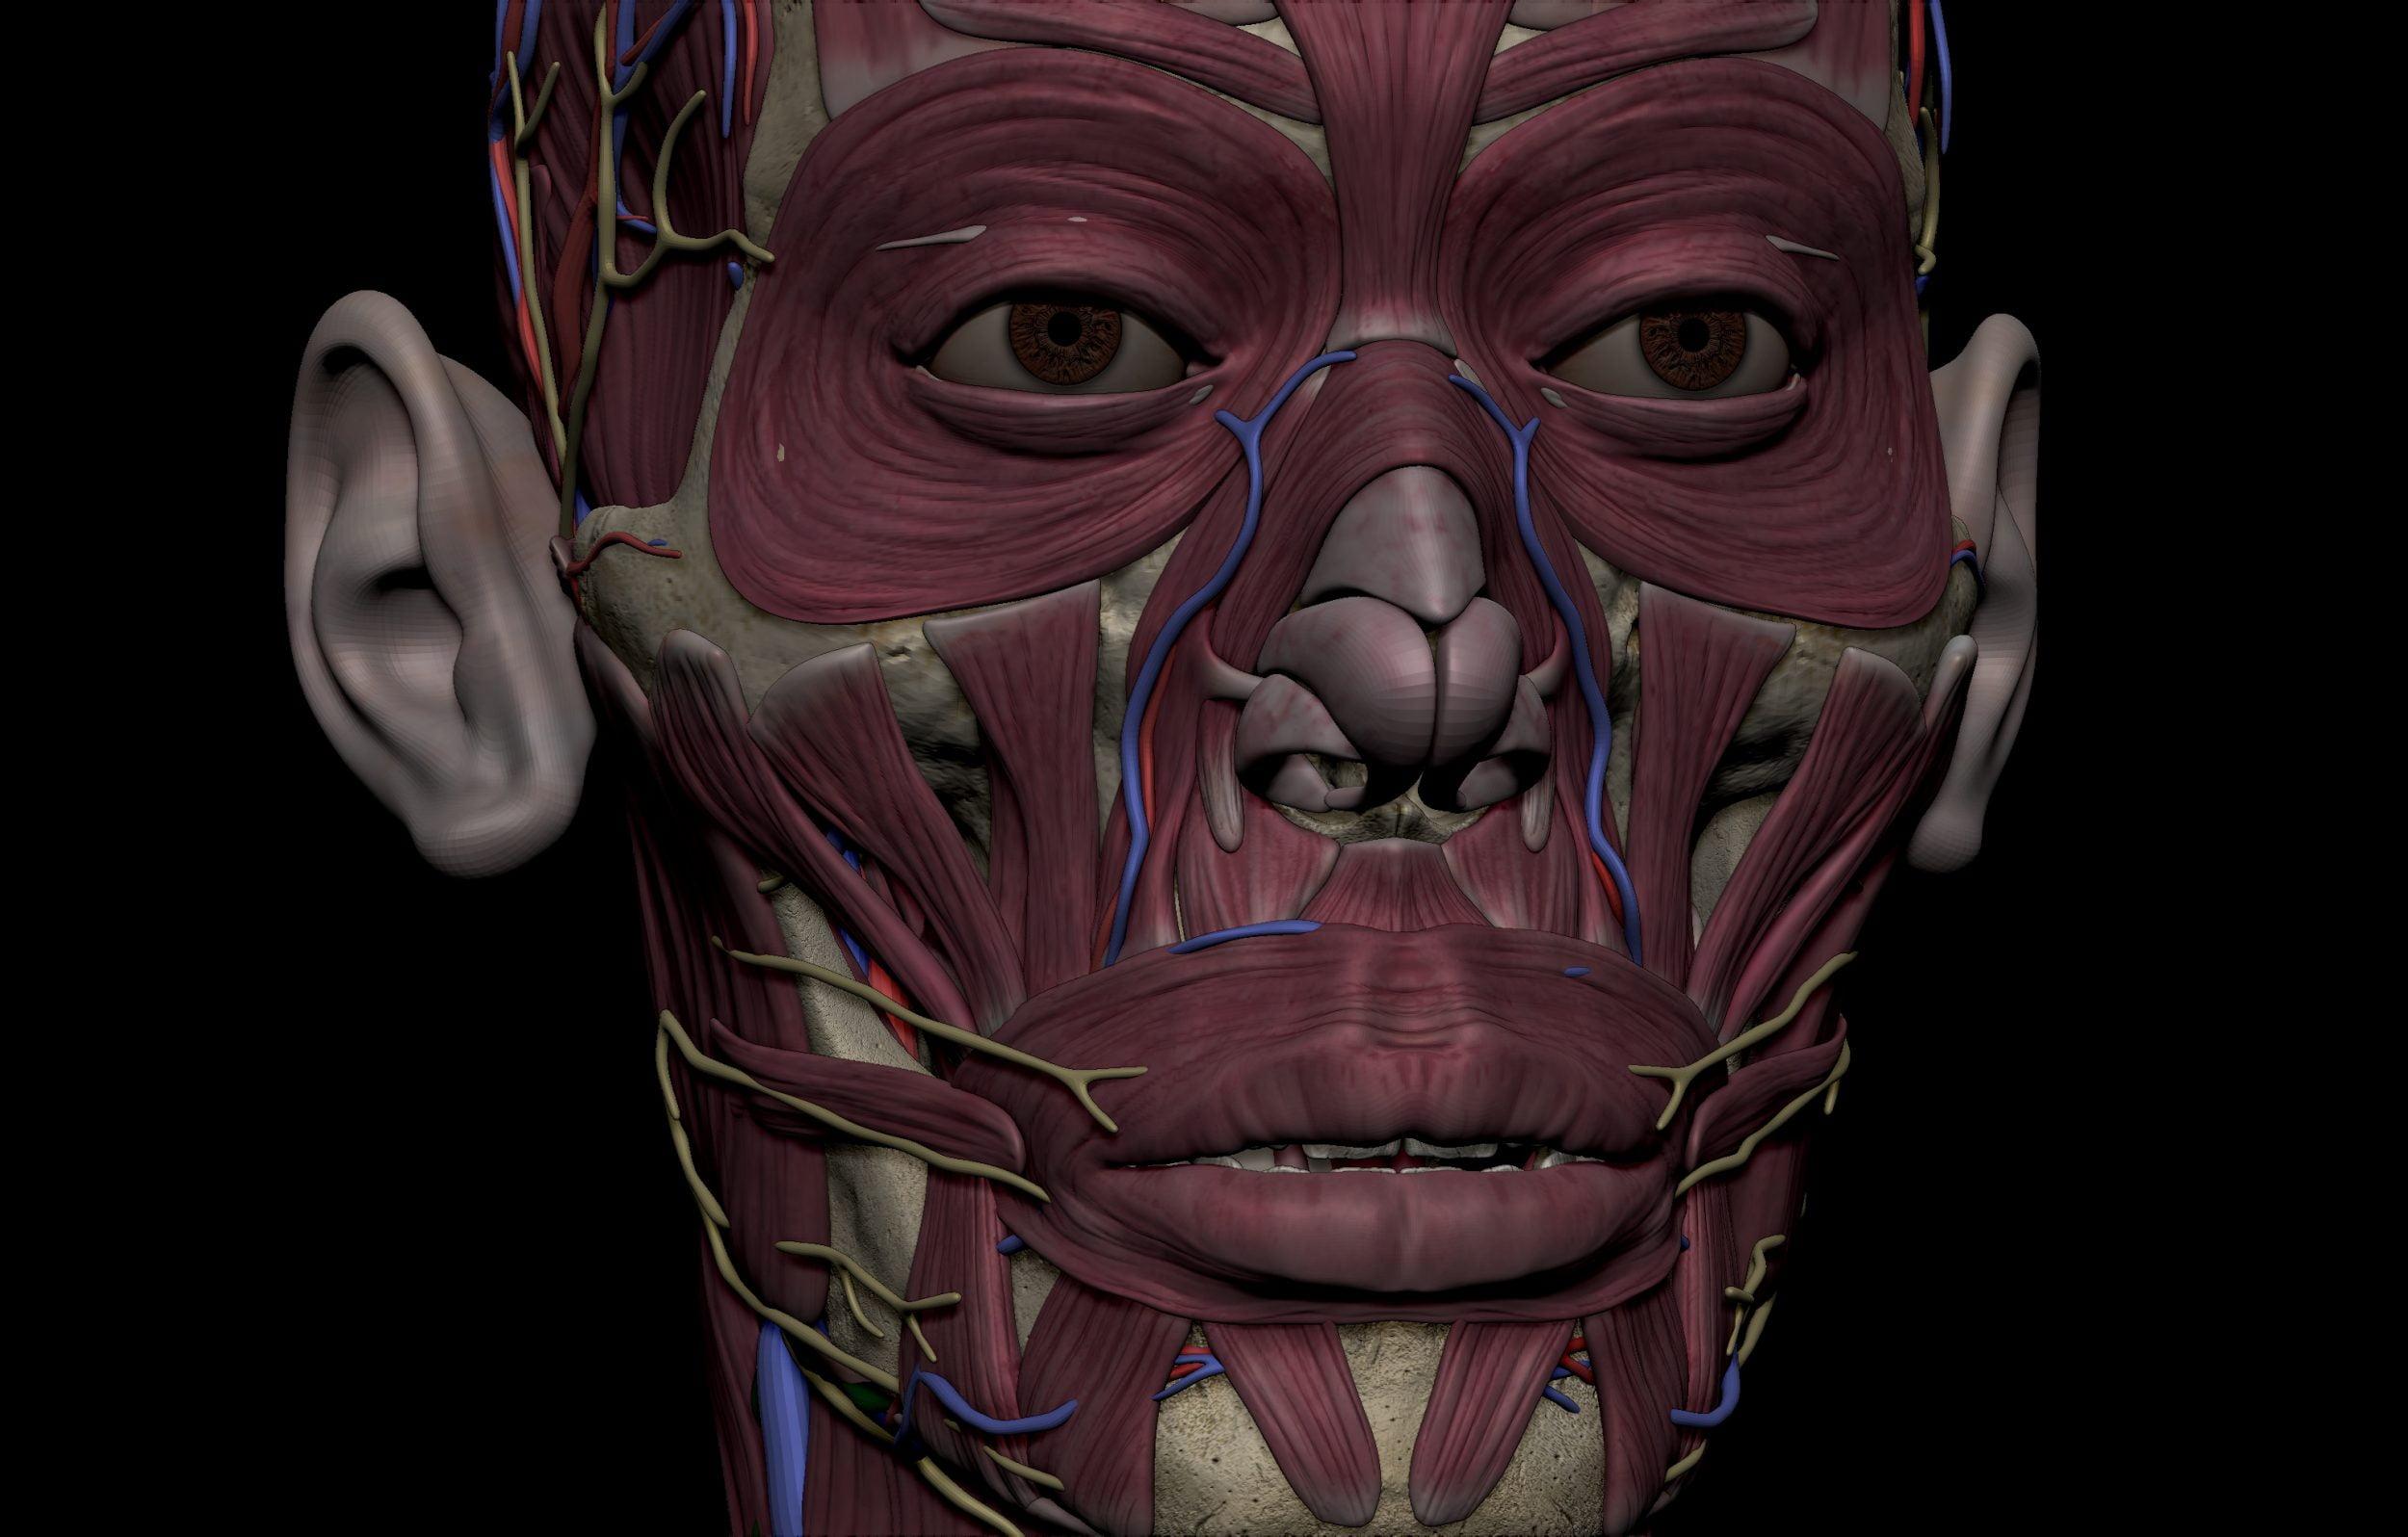 23 scaled SA Anatomy | Study Anatomy in 3D